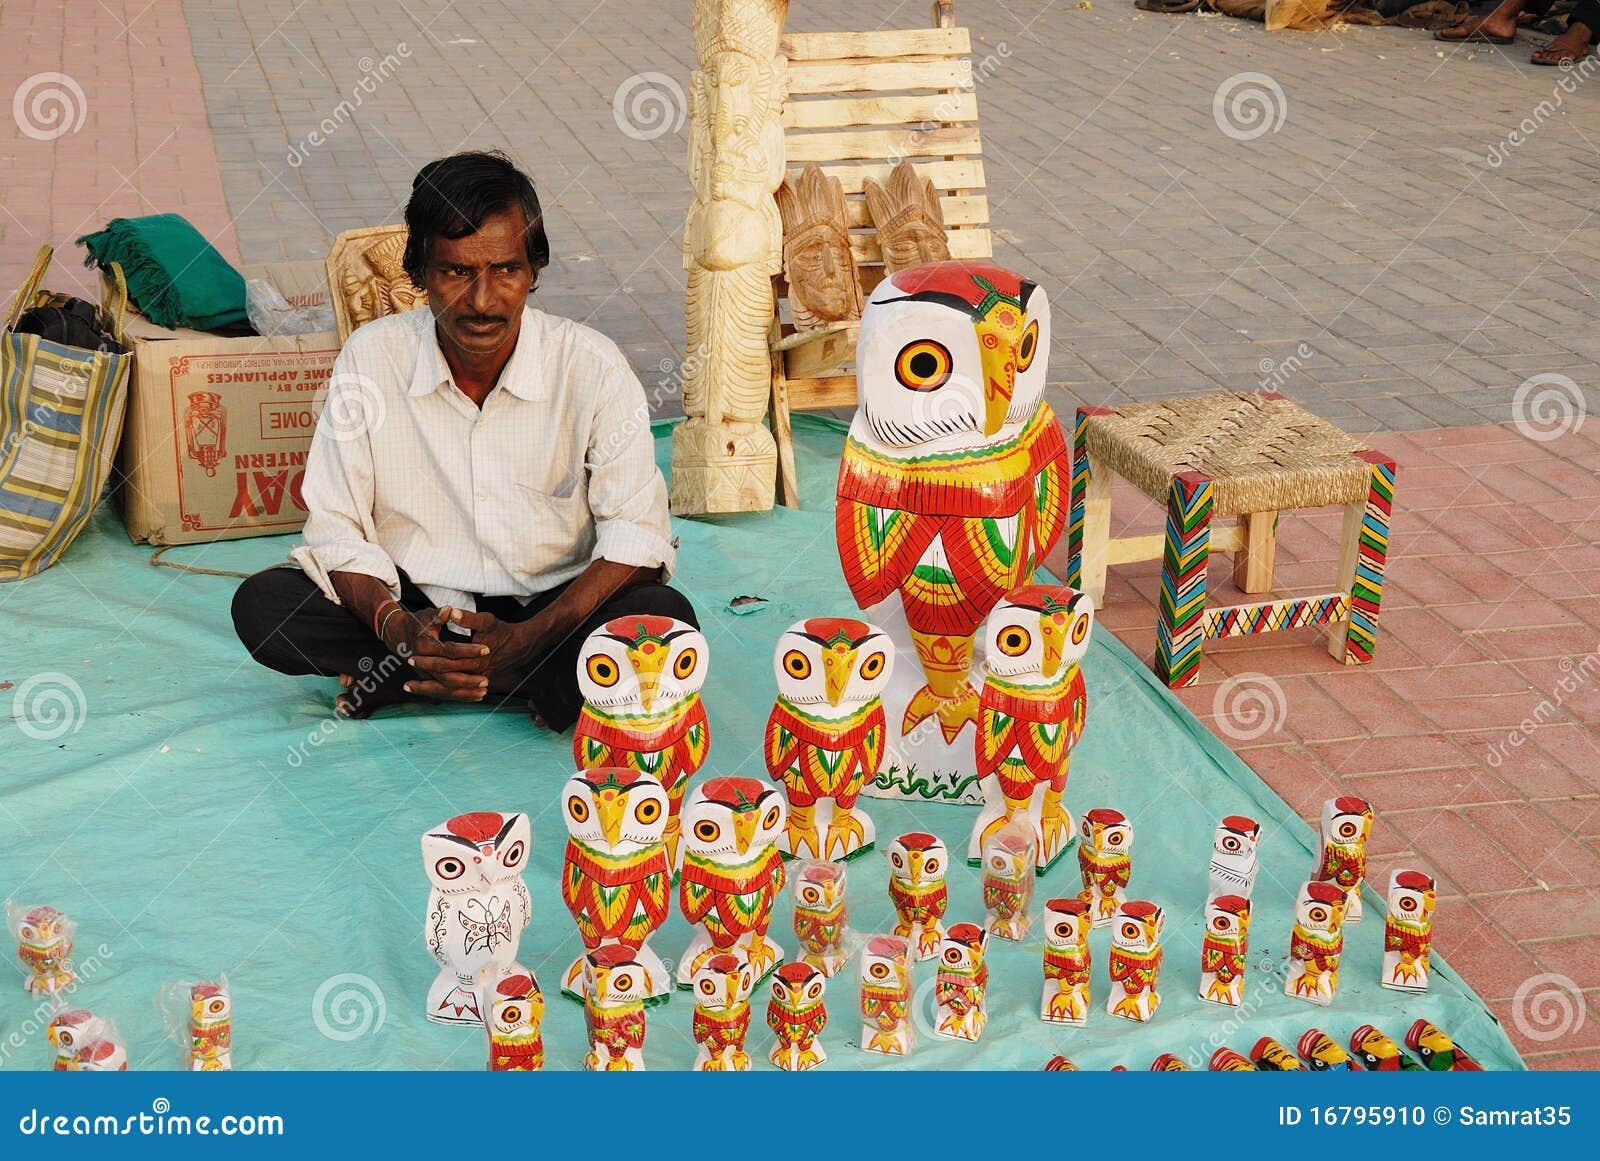 Handicrafts In India Editorial Image Image Of Artistic 16795910